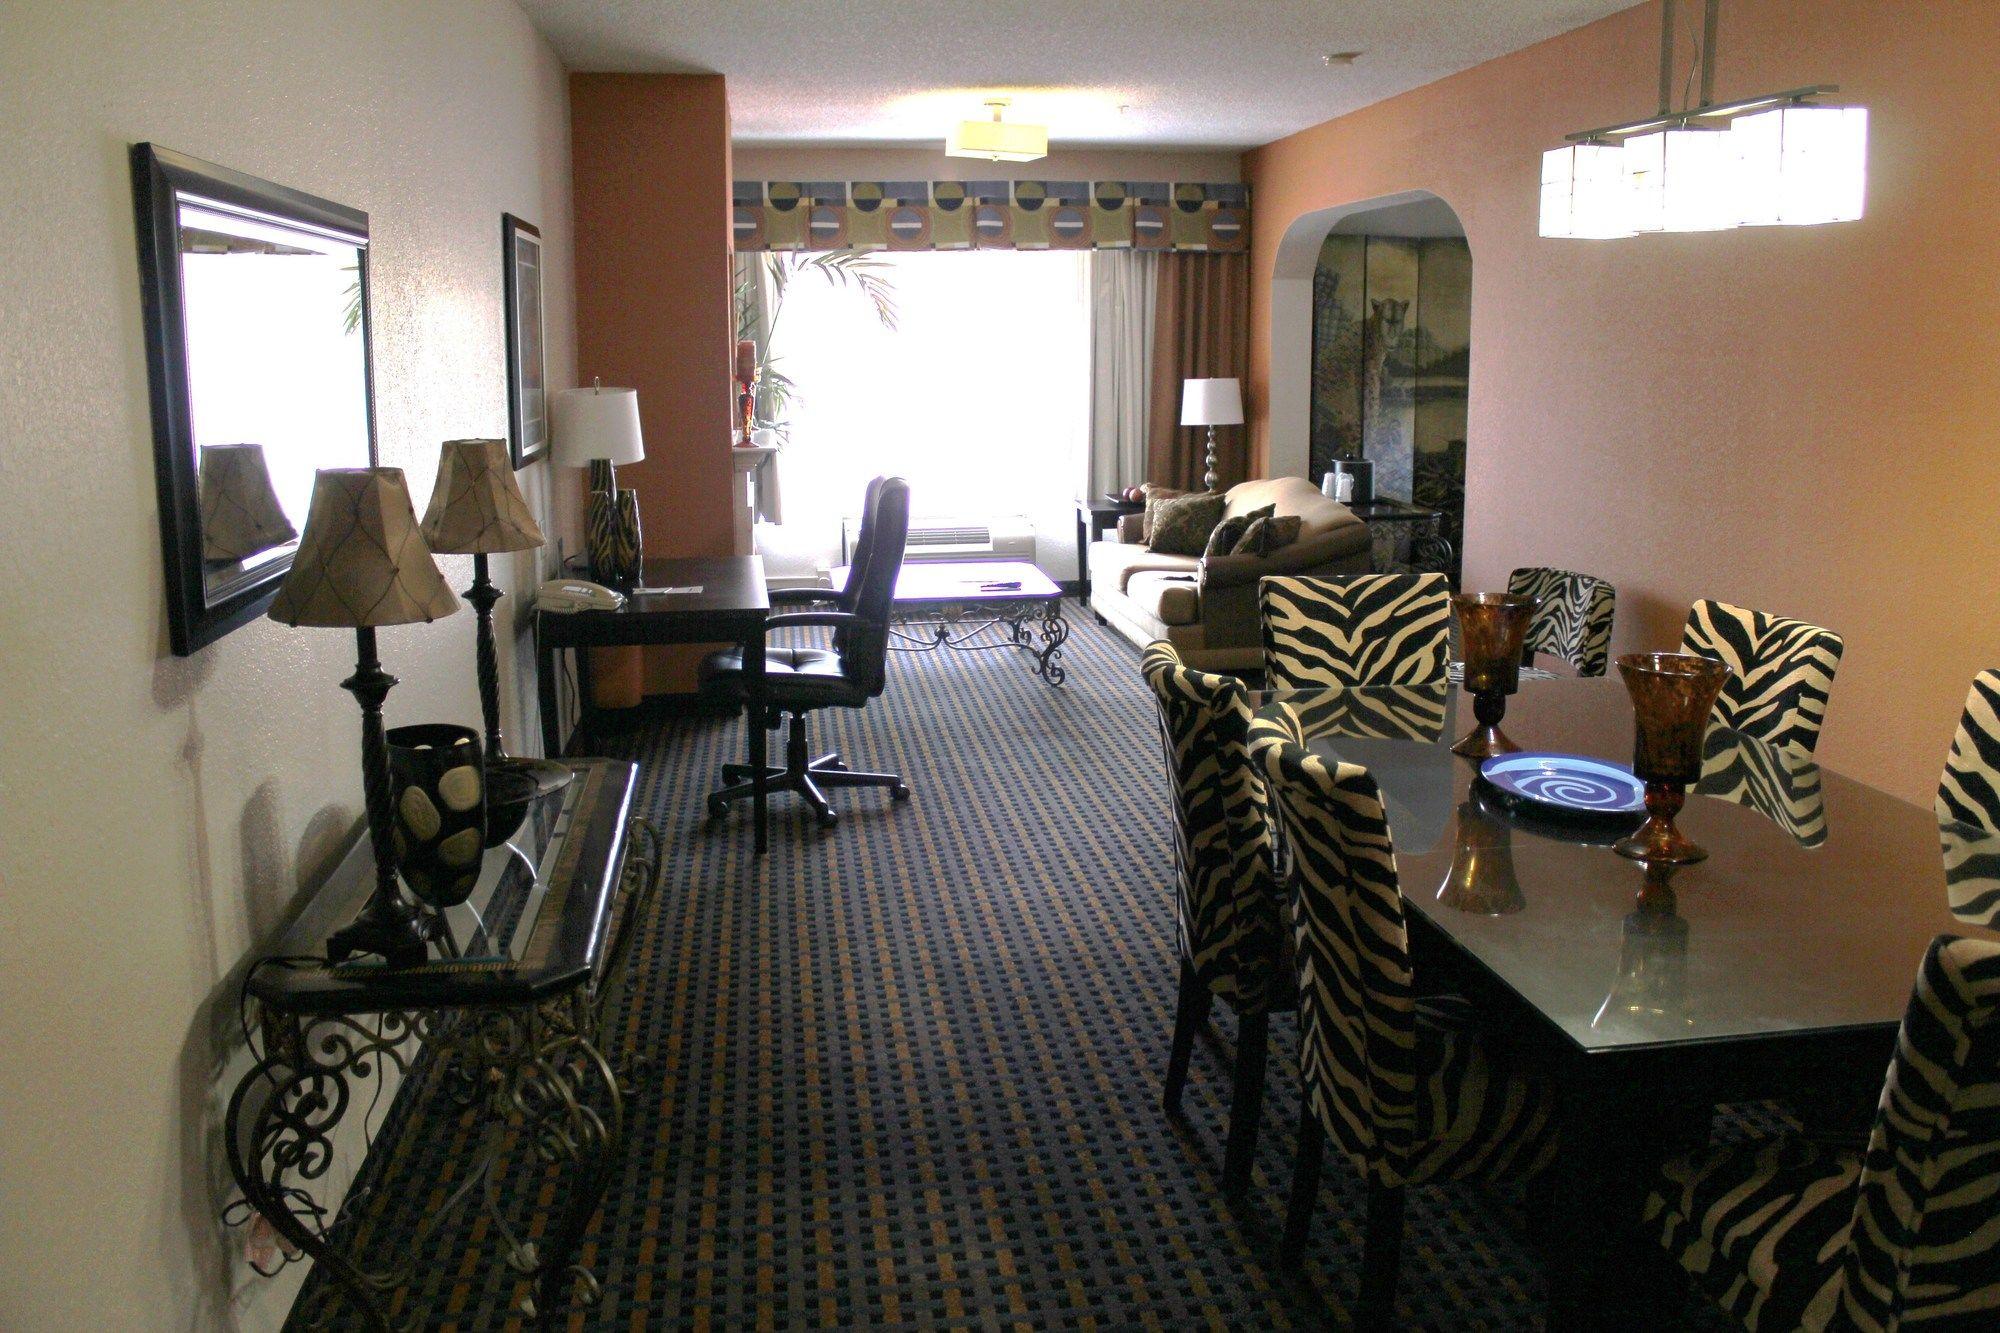 Holiday Inn Express & Suites Asheboro in Asheboro, NC